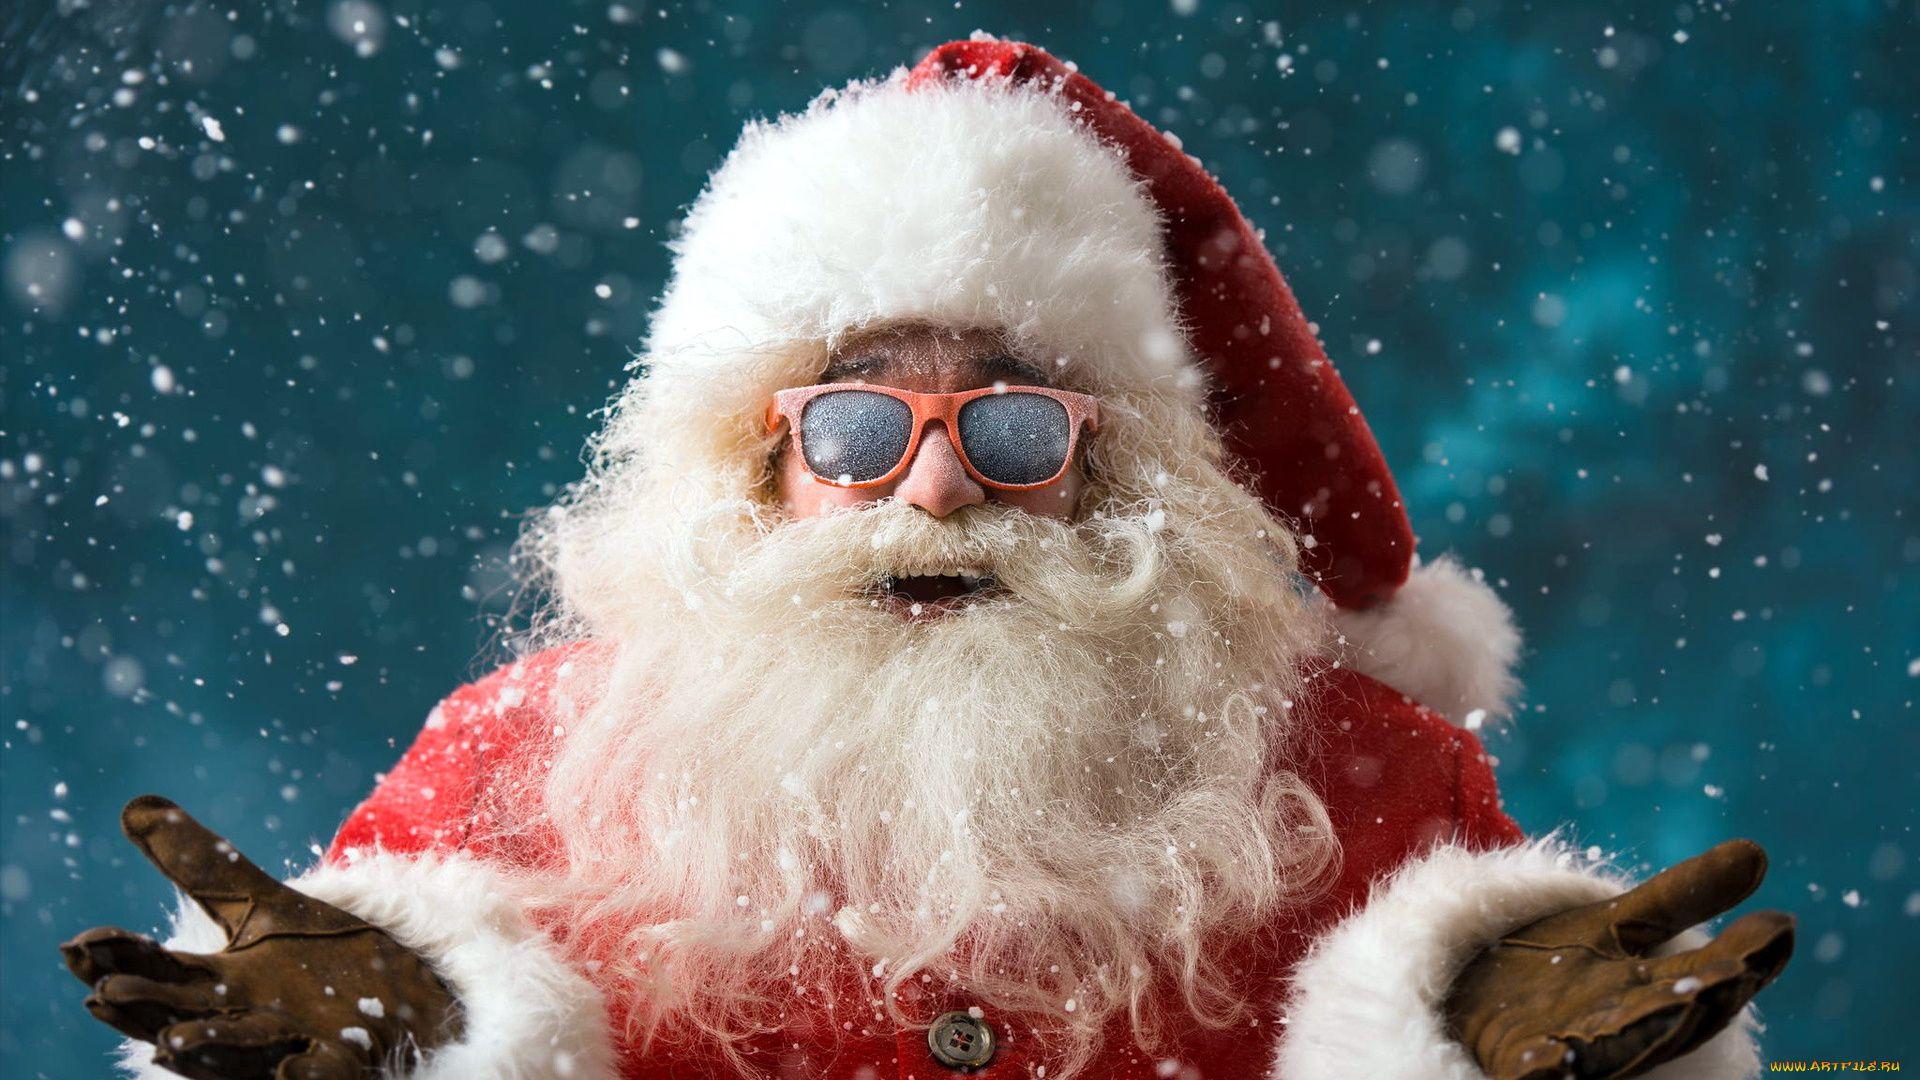 Santa Claus Cool HD Wallpaper